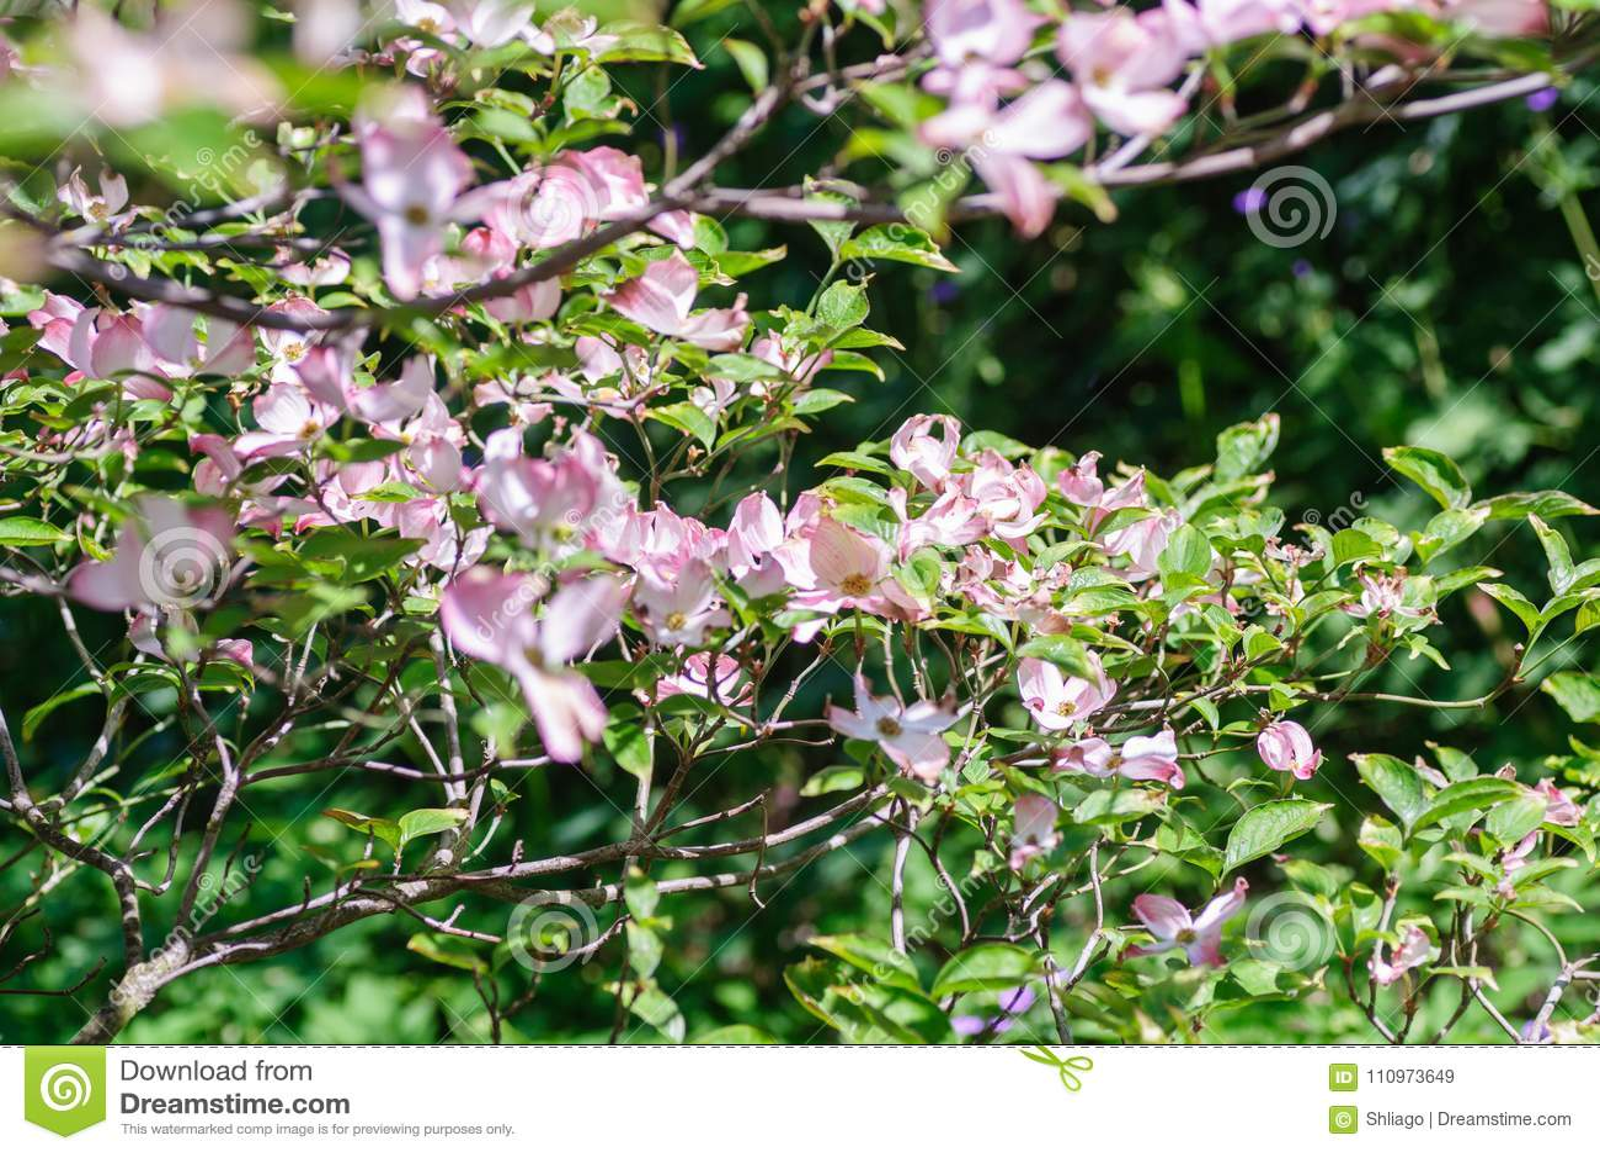 Pink Dogwood Tree Cornus Florida In Full Bloom In Springtime